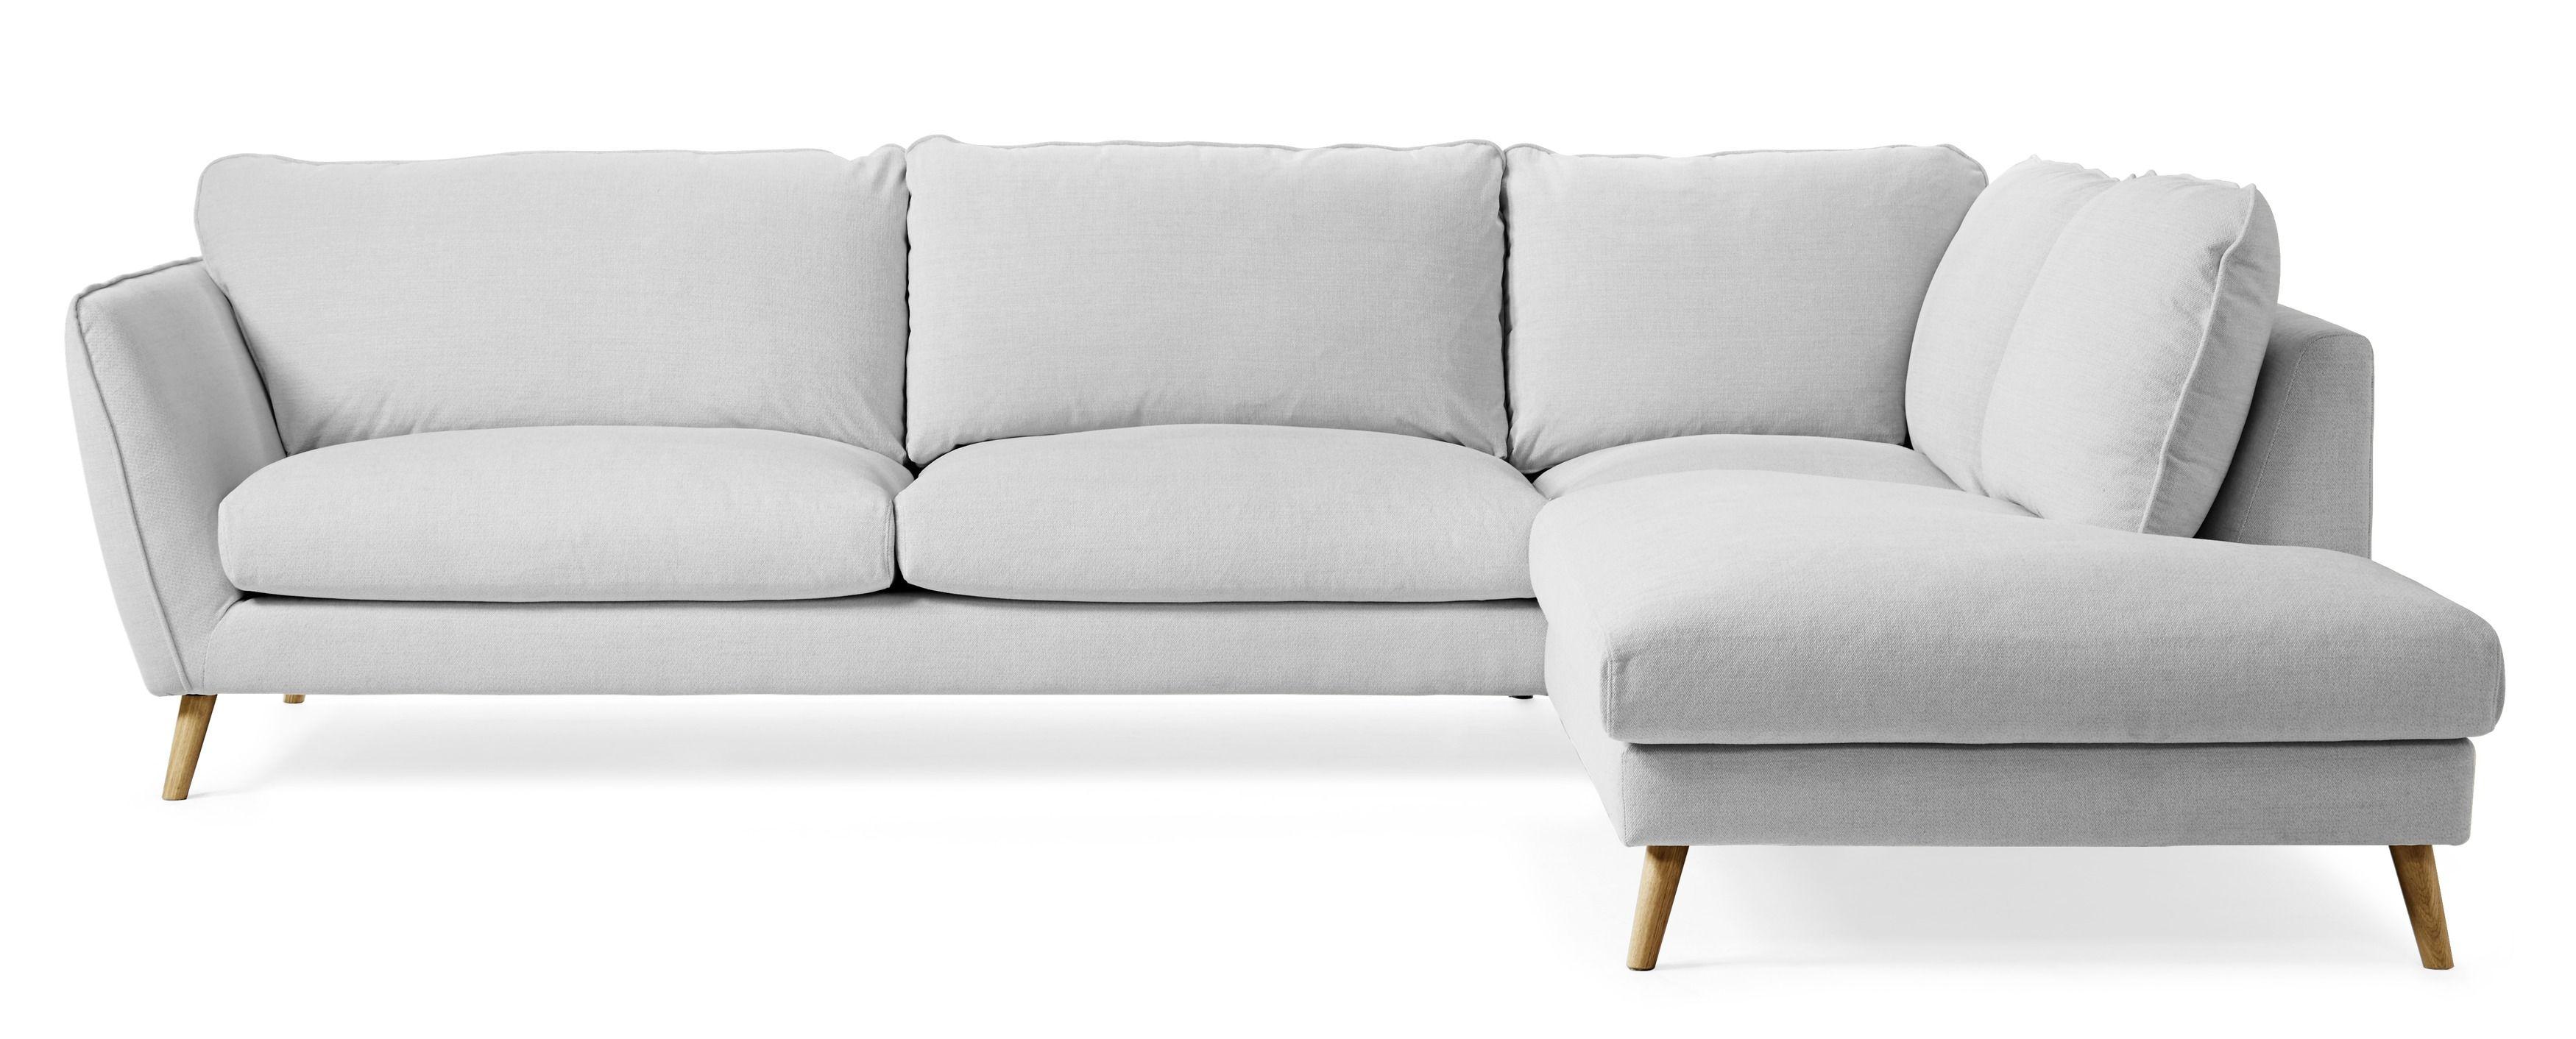 Lazy kulmadivaani – Hakola CornerSofa Corner Sofa